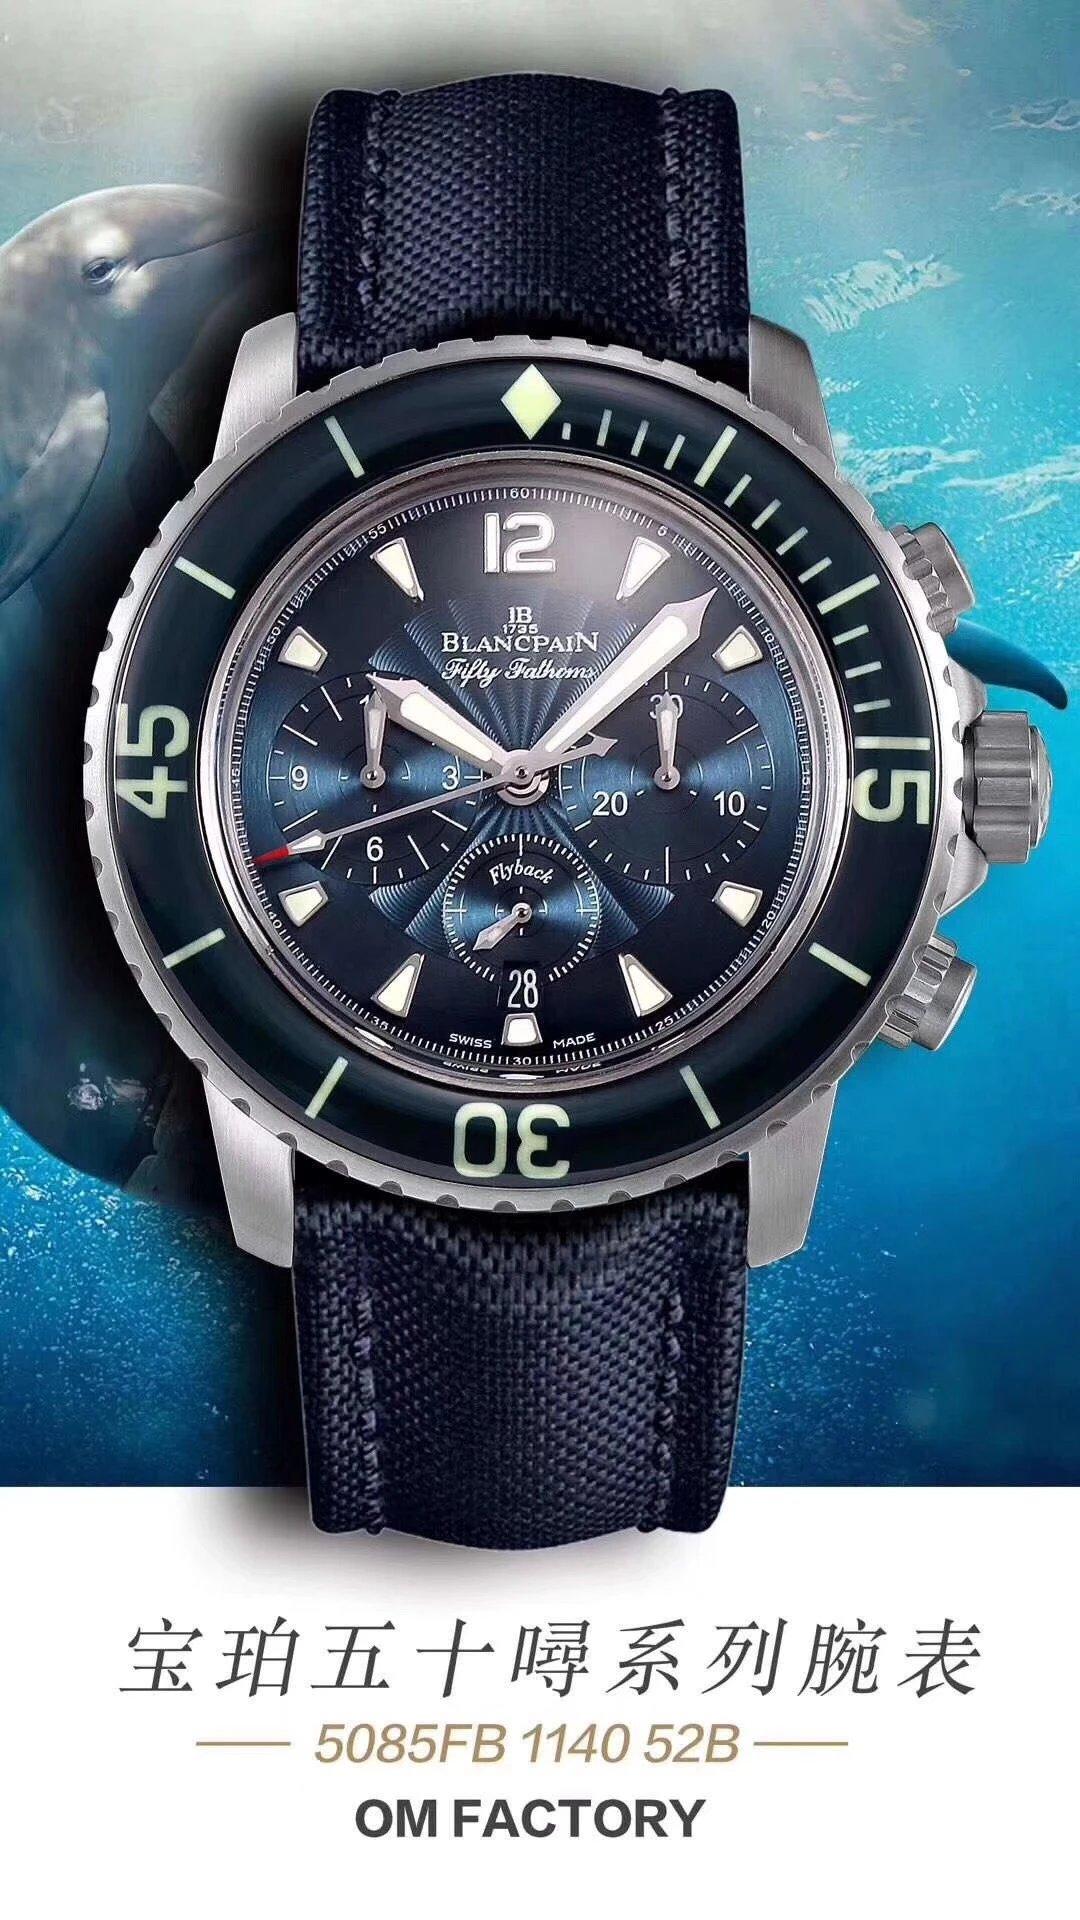 OM厂宝珀五十寻系列计时5085F 直径45x15.5毫米精钢,五十寻男士腕表,自动机械机芯,绢丝表